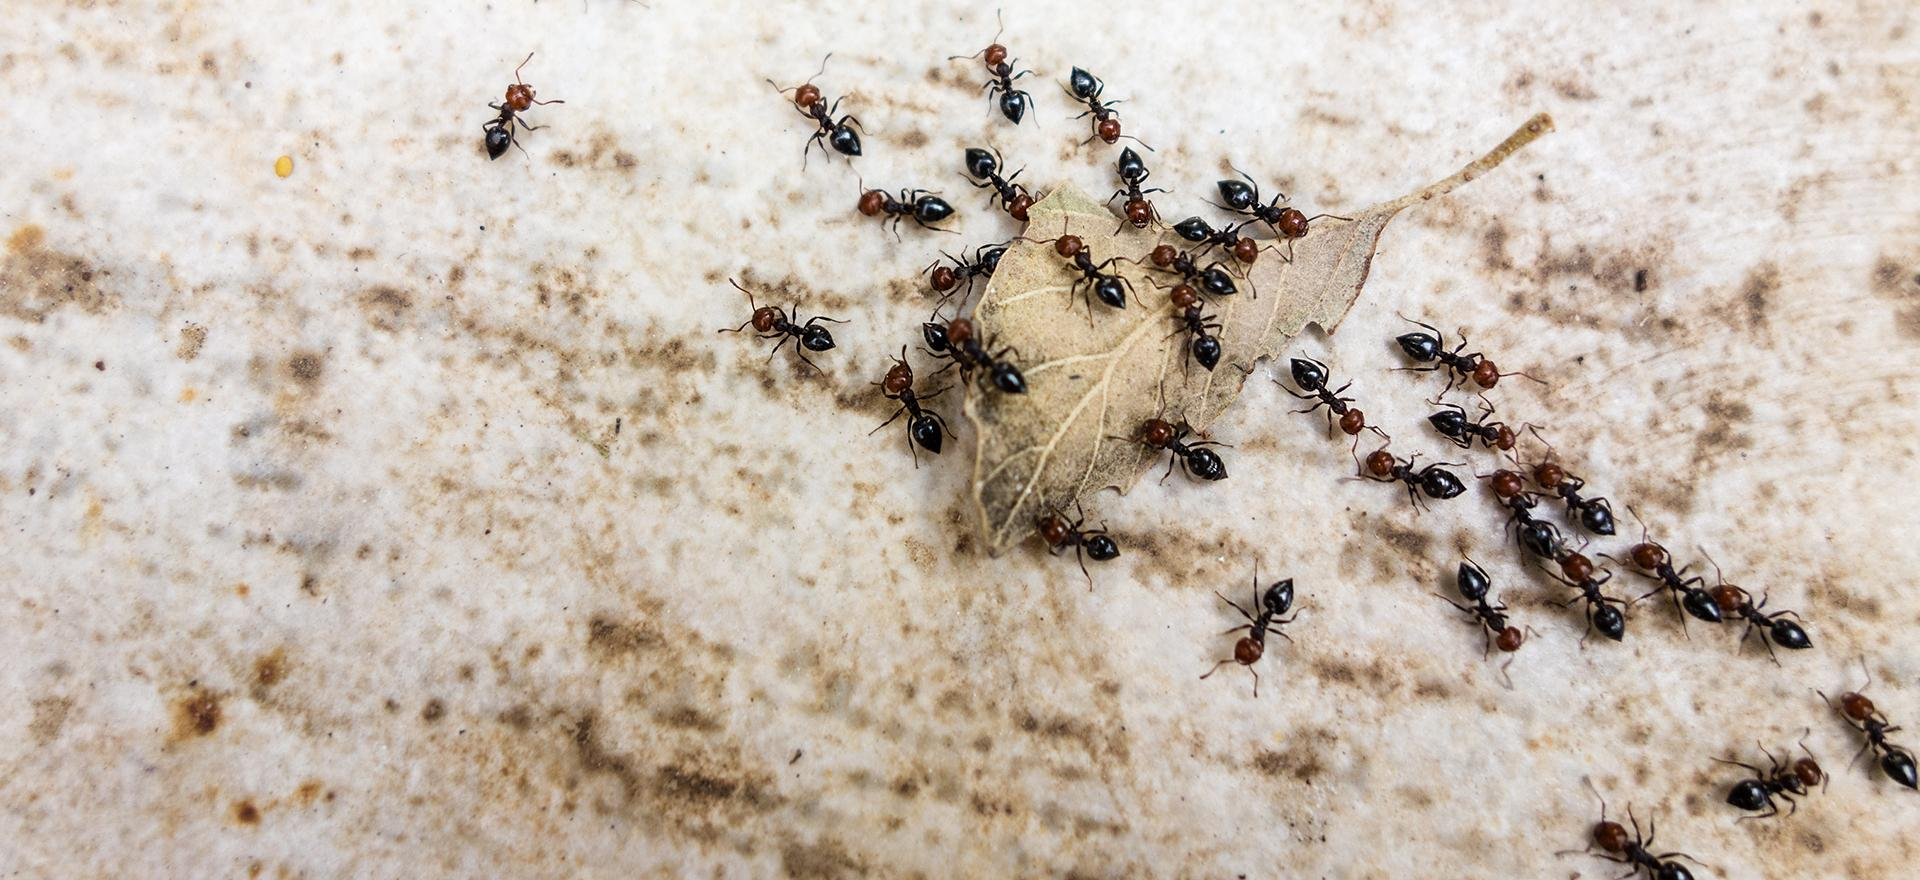 ants in pennsylvania